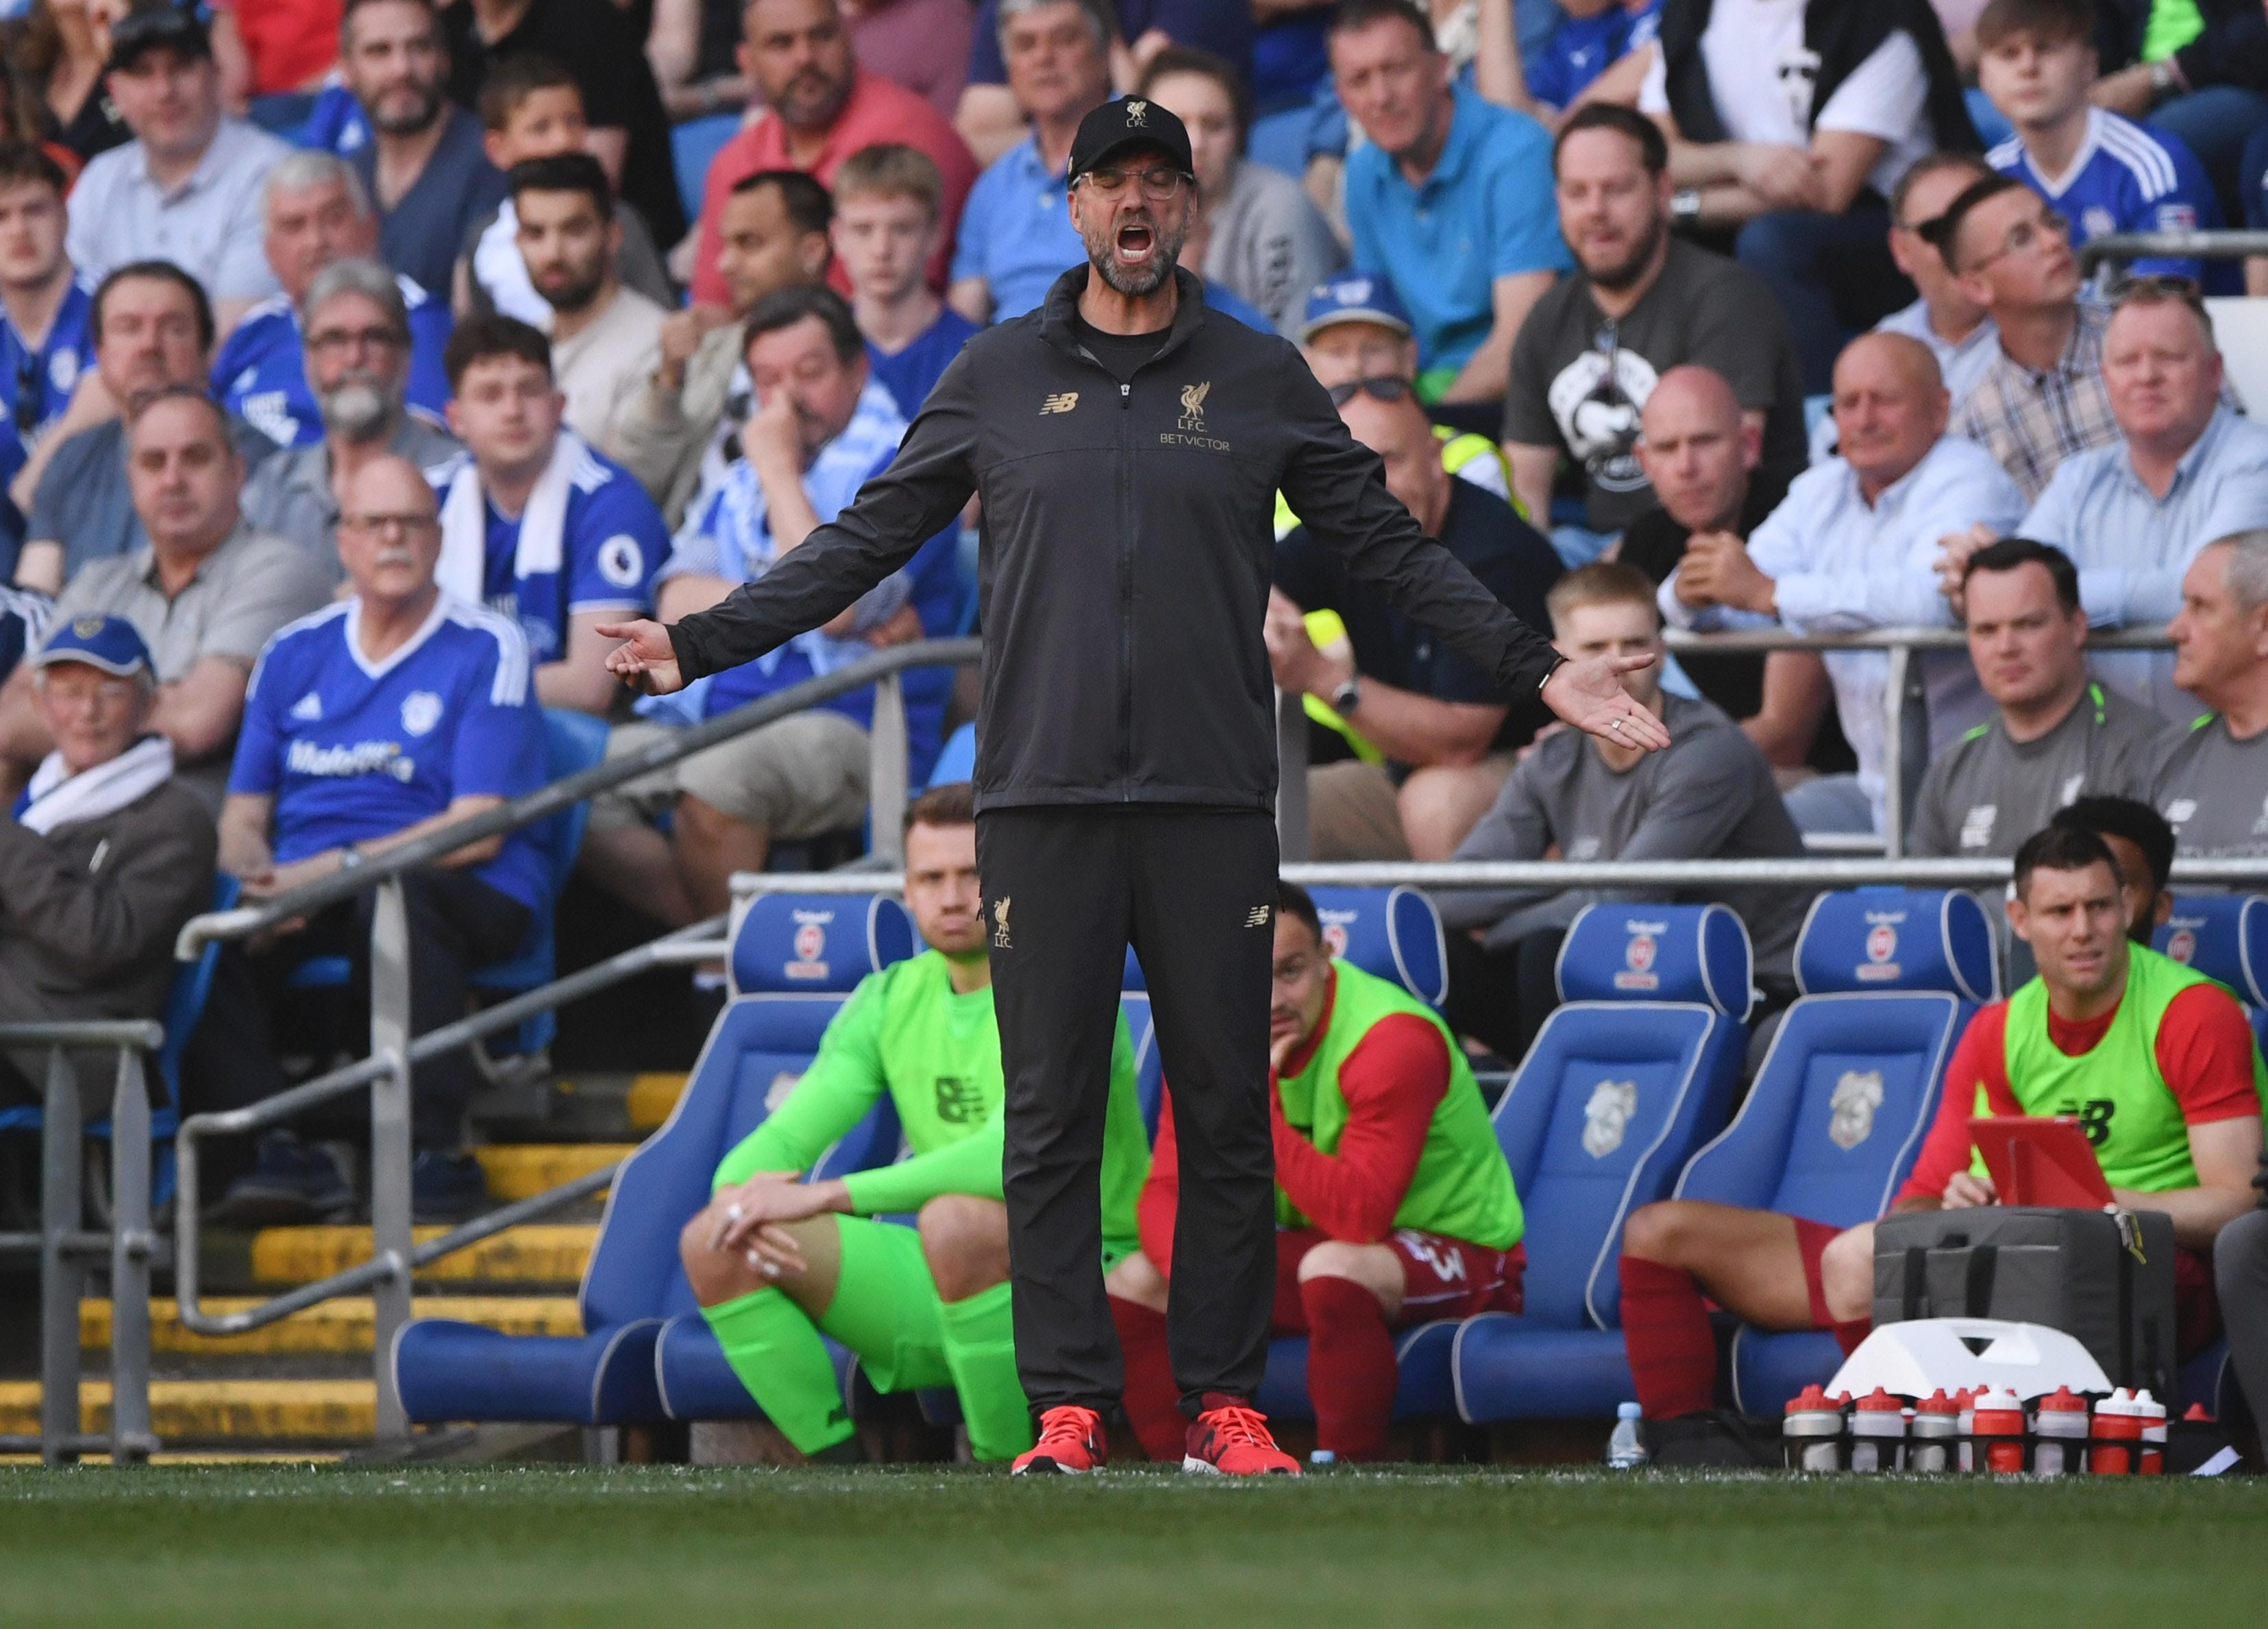 Aldri tidligere har Liverpool plukket flere poeng i en Premier League-sesong